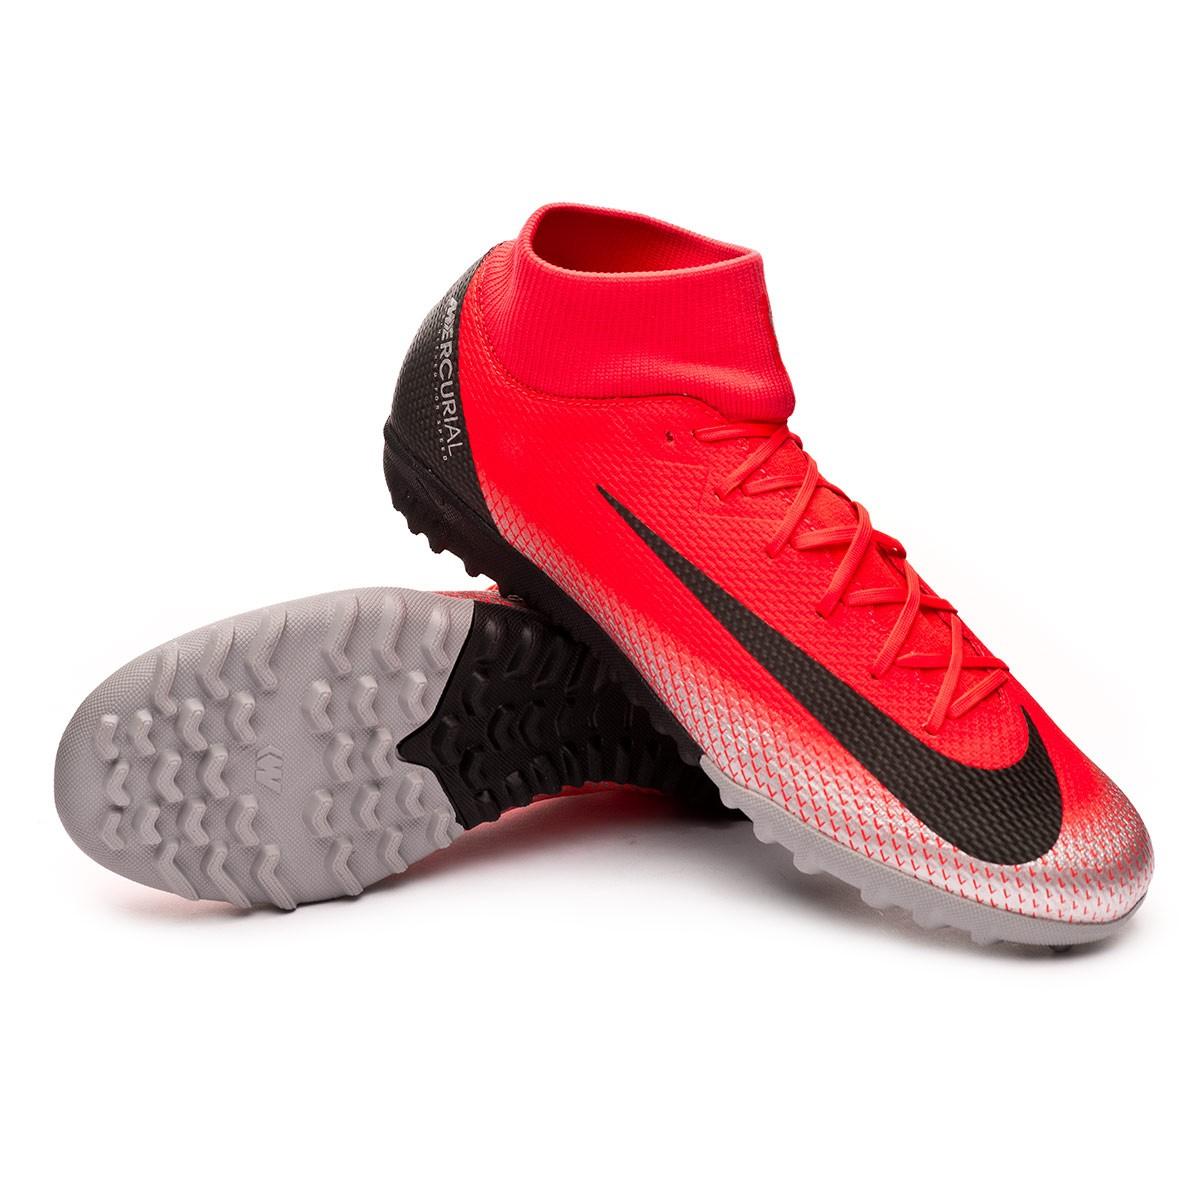 3485ab2b5 Football Boot Nike Mercurial SuperflyX VI Academy CR7 Turf Bright crimson- Black-Chrome-Dark grey - Tienda de fútbol Fútbol Emotion